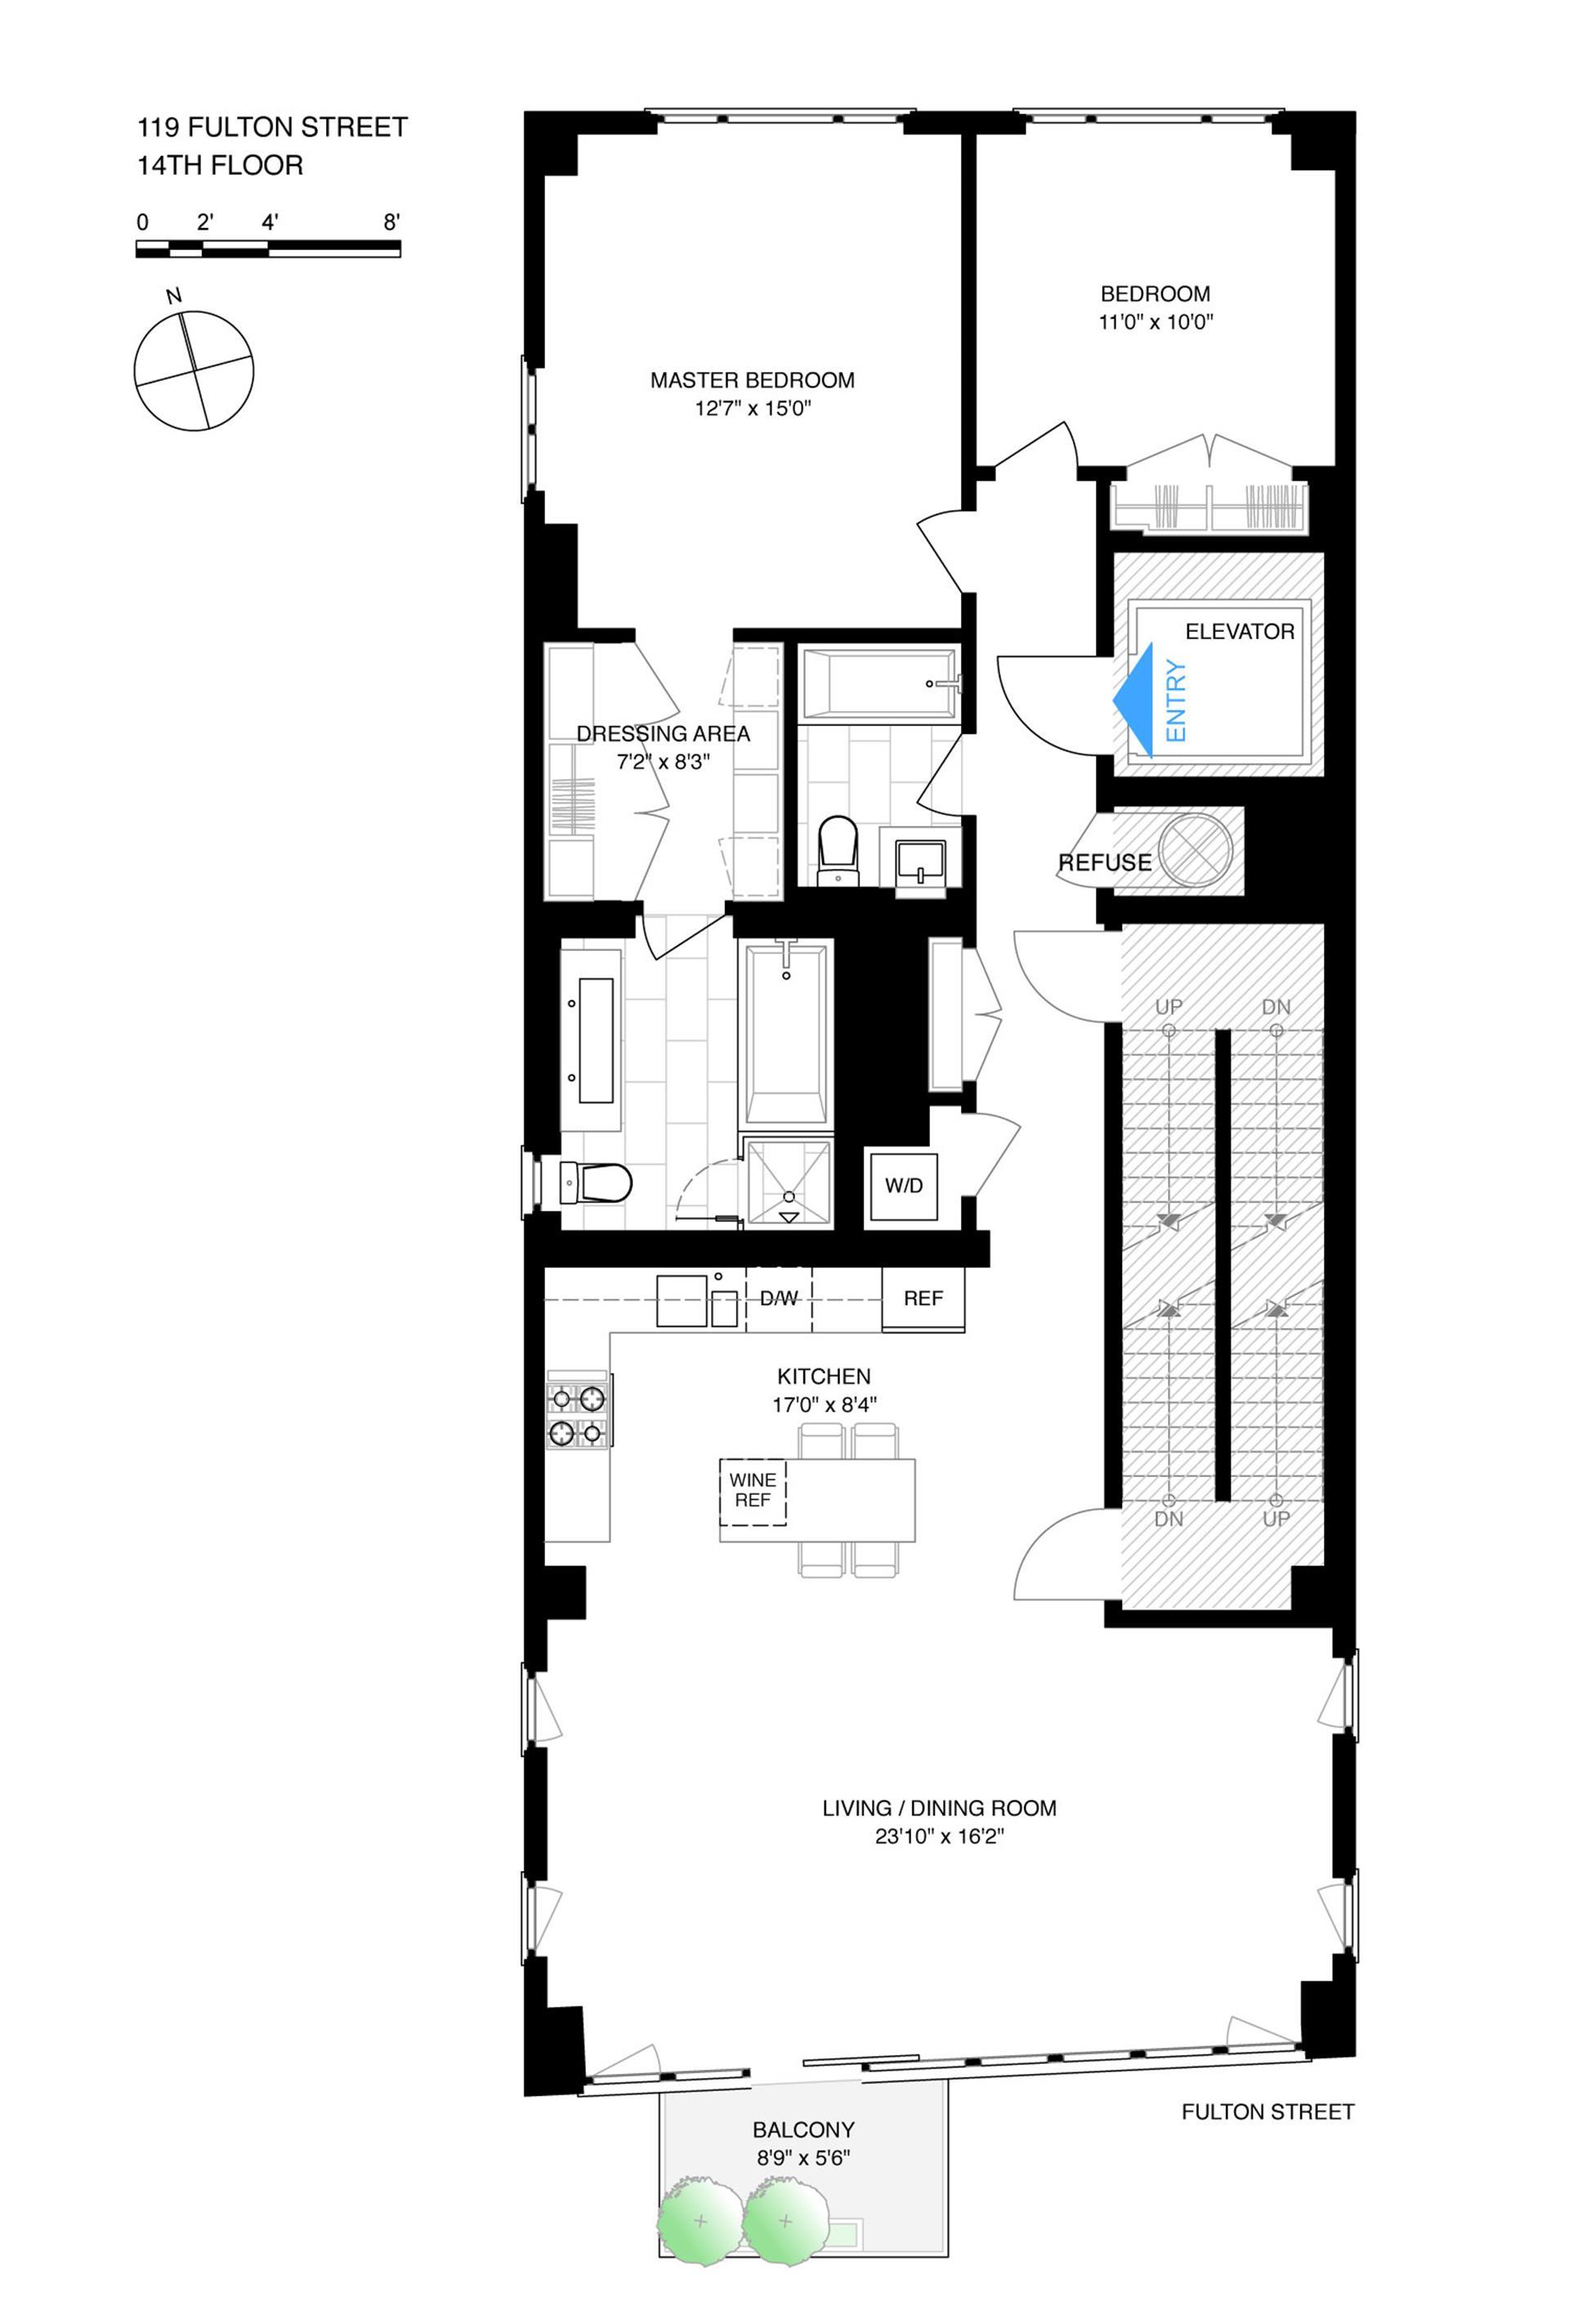 Floor plan of 119 Fulton St, 14 - Financial District, New York